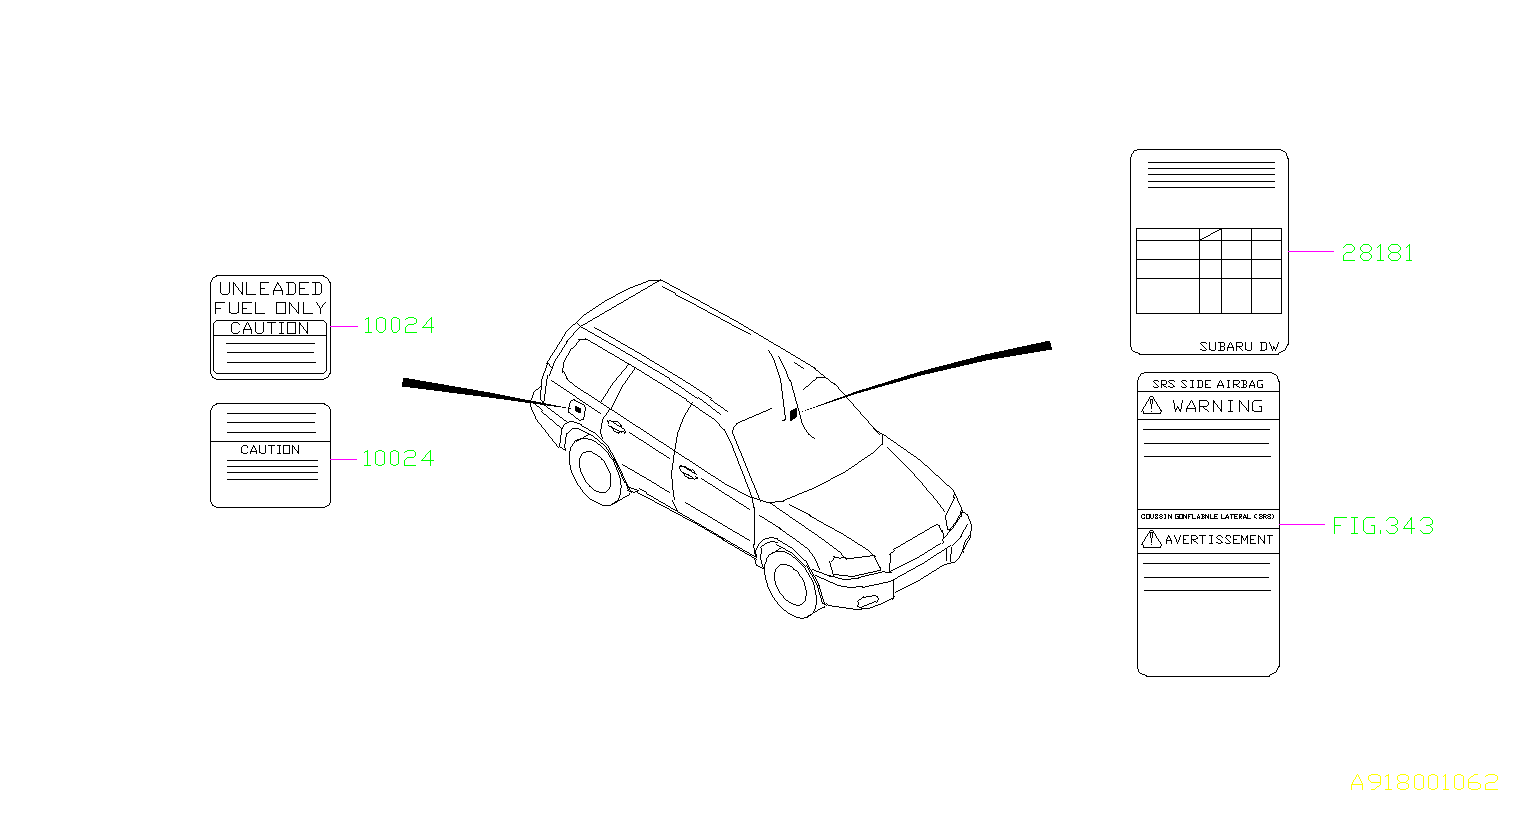 Subaru Forester Fuel Information Label Canada Usa